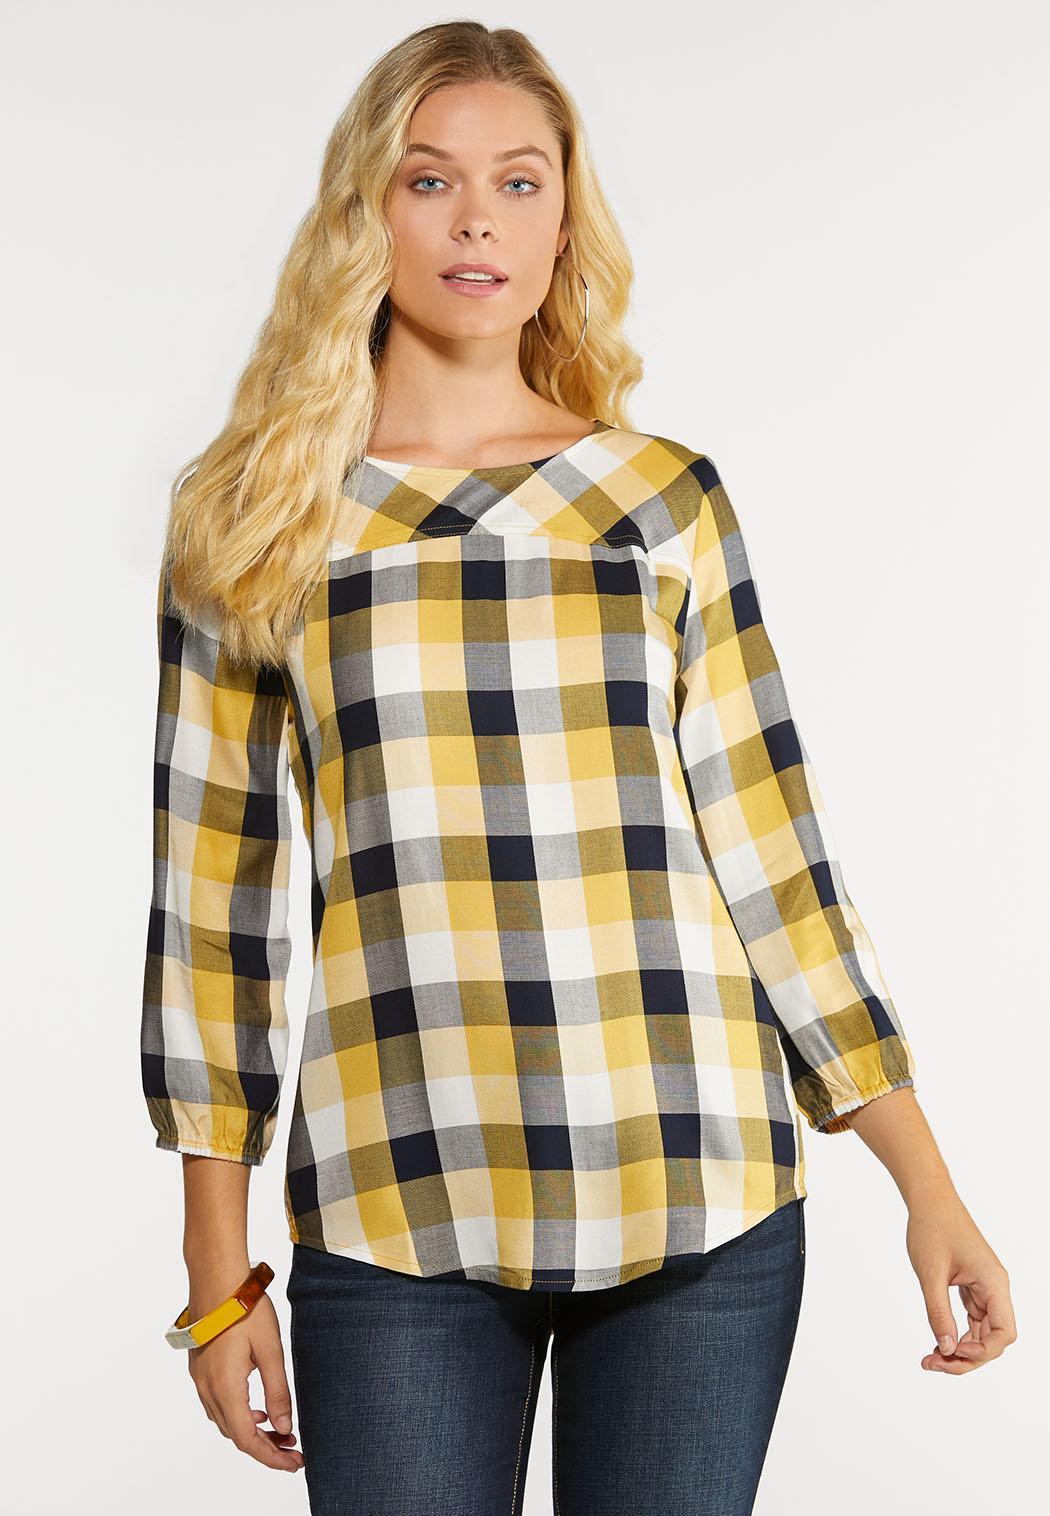 Plus Size Gold And Black Plaid Shirt